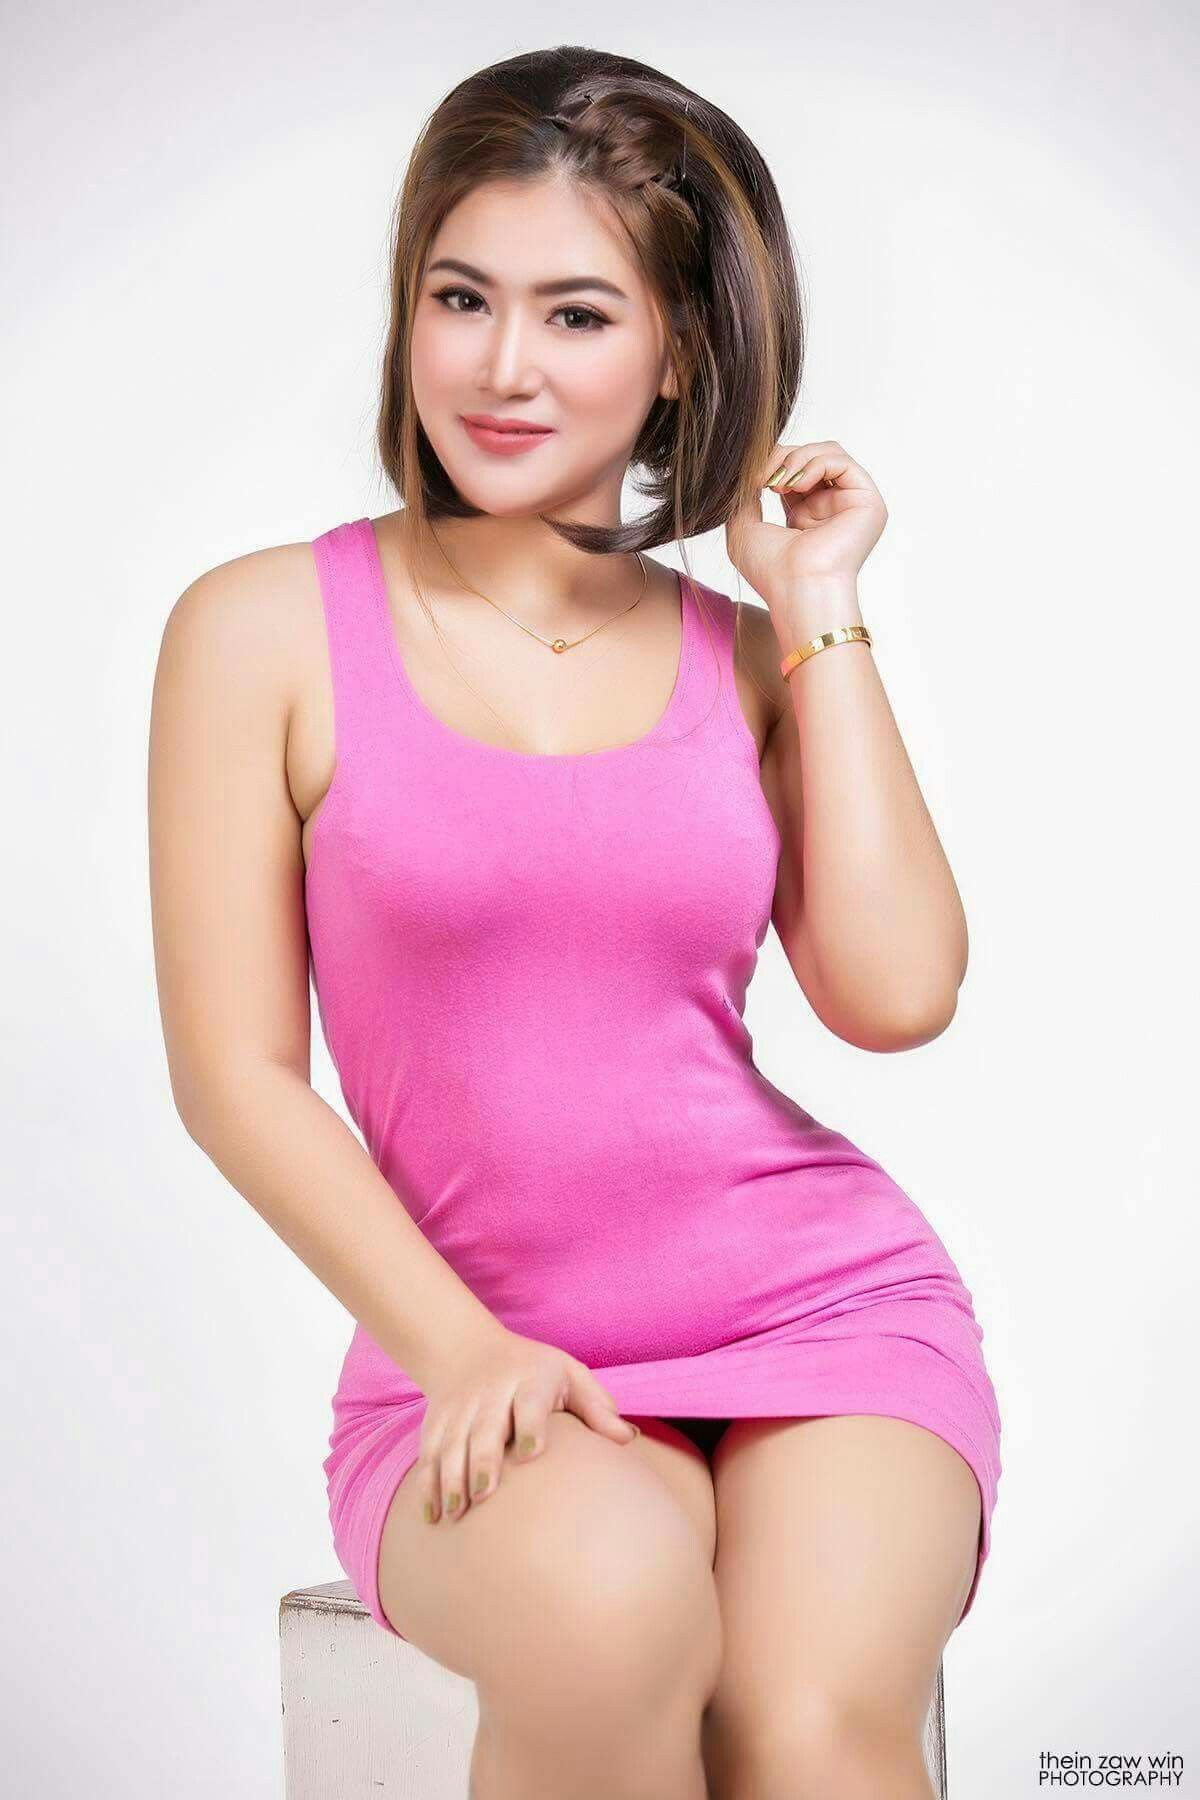 Middle myanmar girl naked